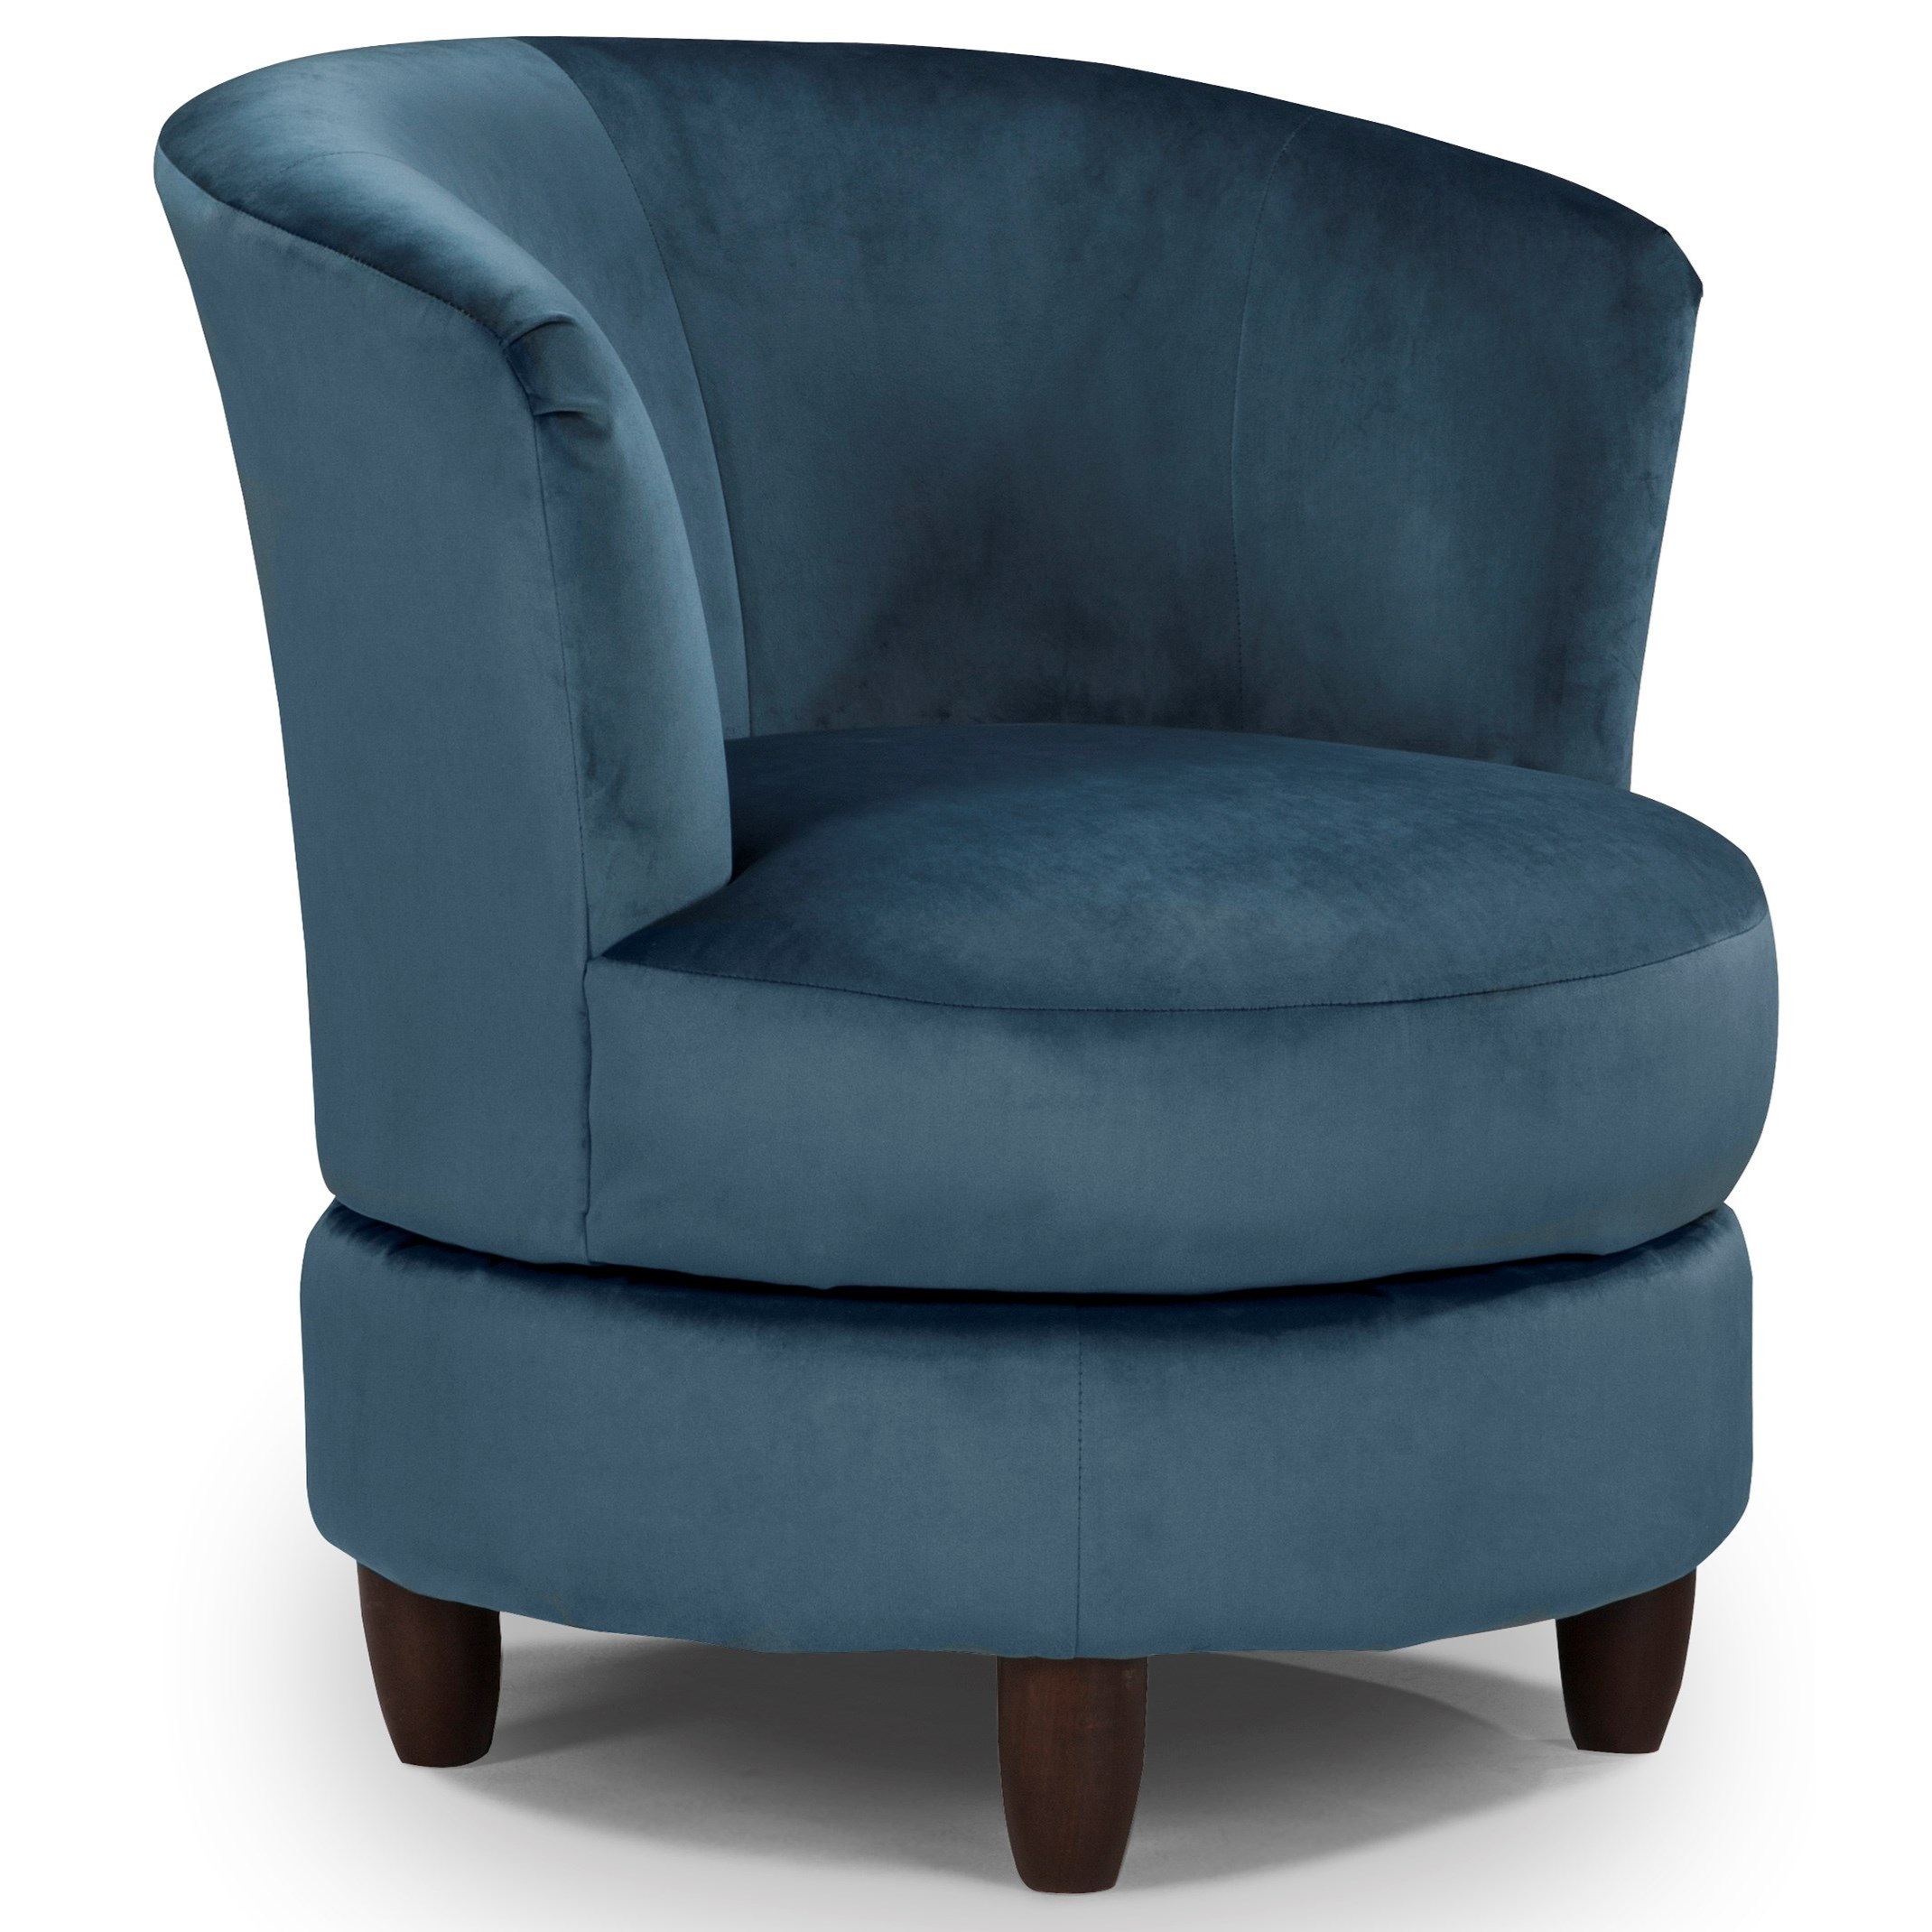 Swivel Barrel Palmona Swivel Chair by Best Home Furnishings at Walker's Furniture